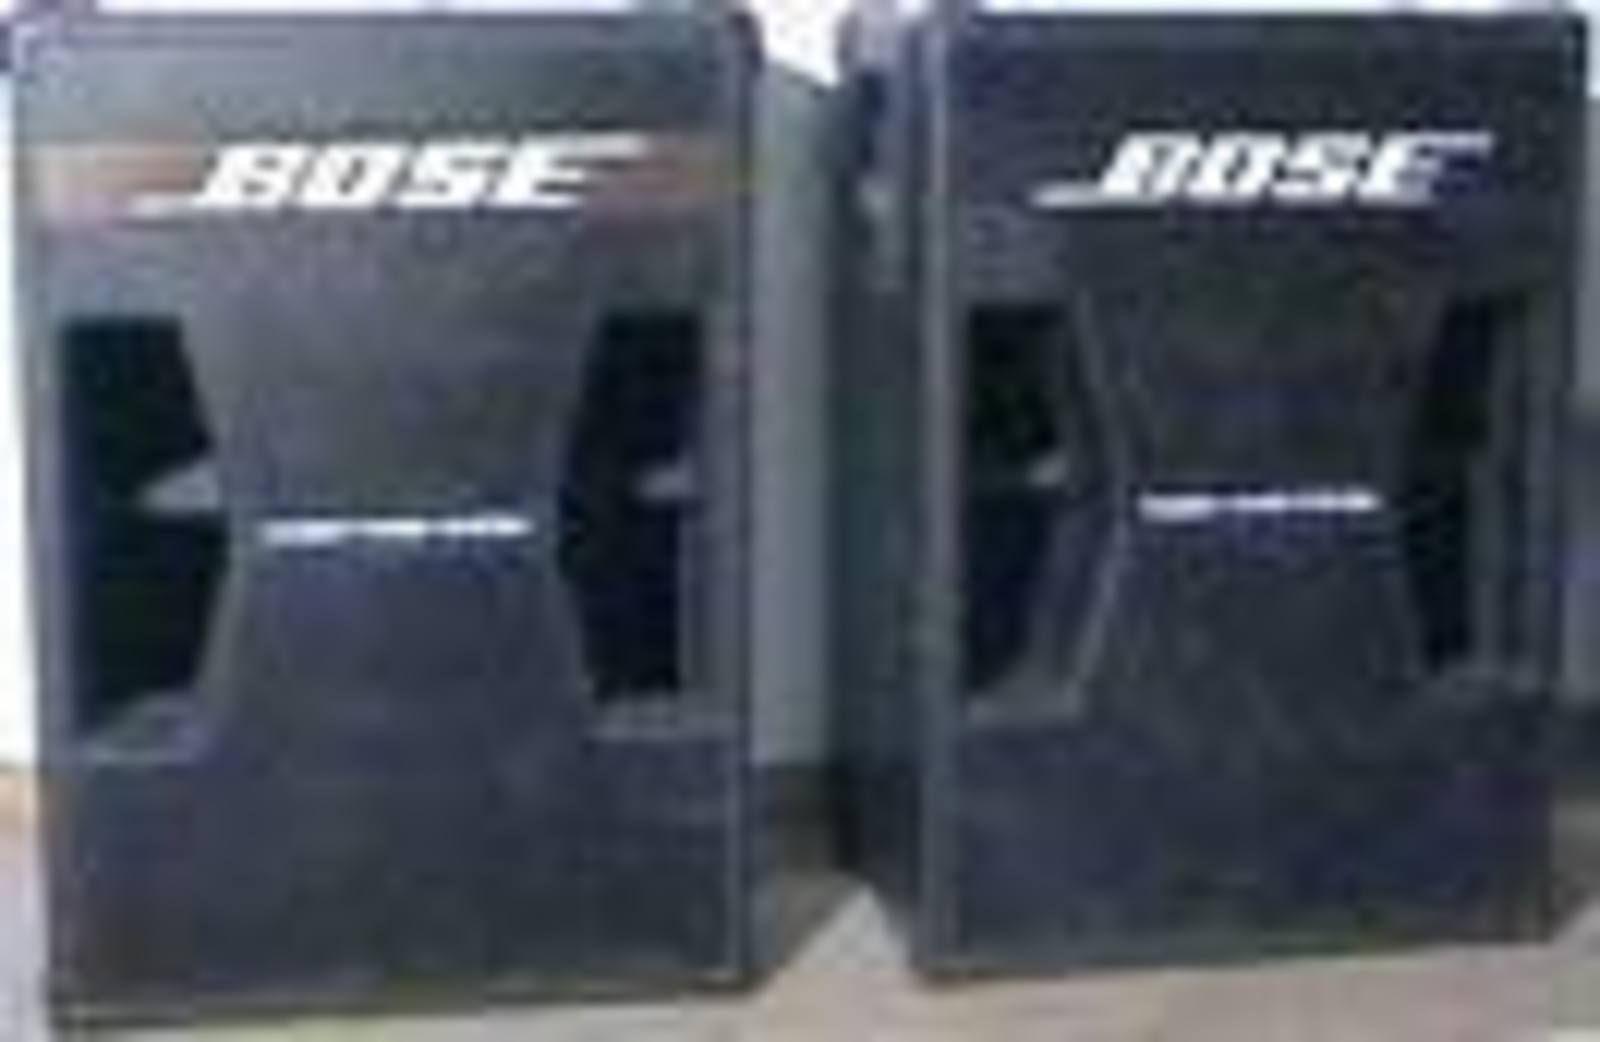 photo bose 302 bose caisson de bass 302 14699 audiofanzine. Black Bedroom Furniture Sets. Home Design Ideas